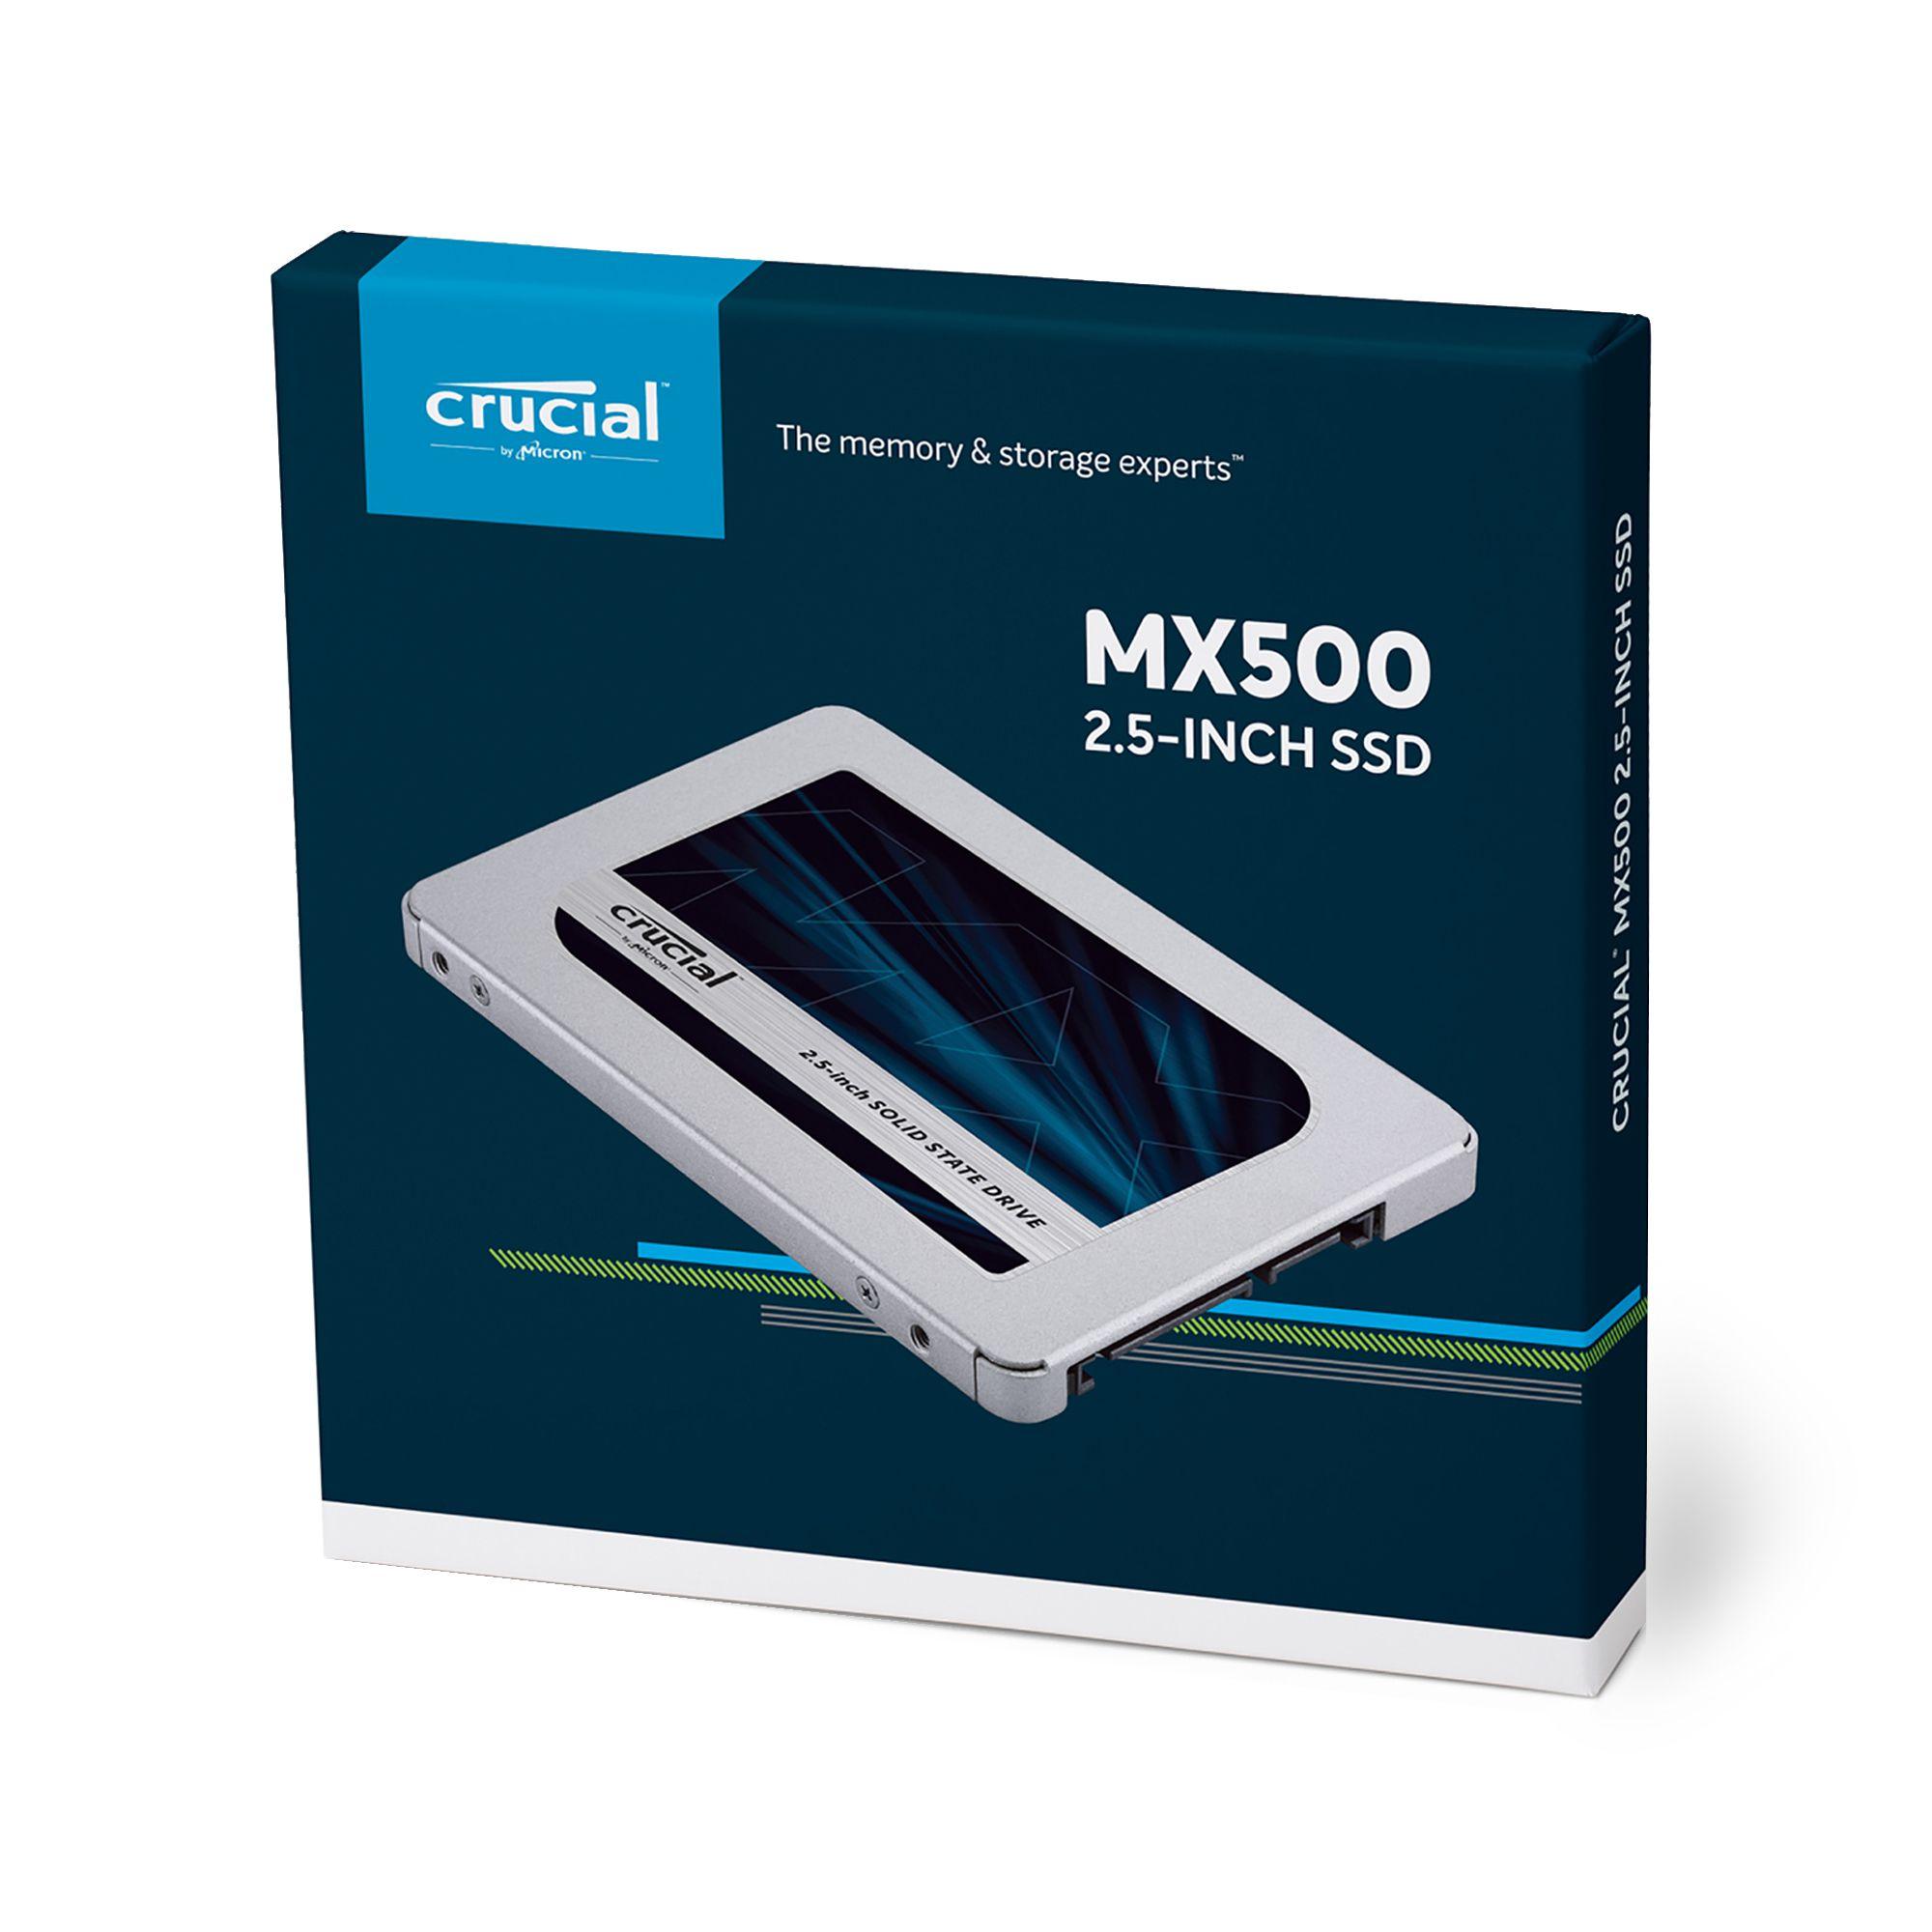 SSD Crucial MX500 3D NAND SATA III 2.5 inch 250GB